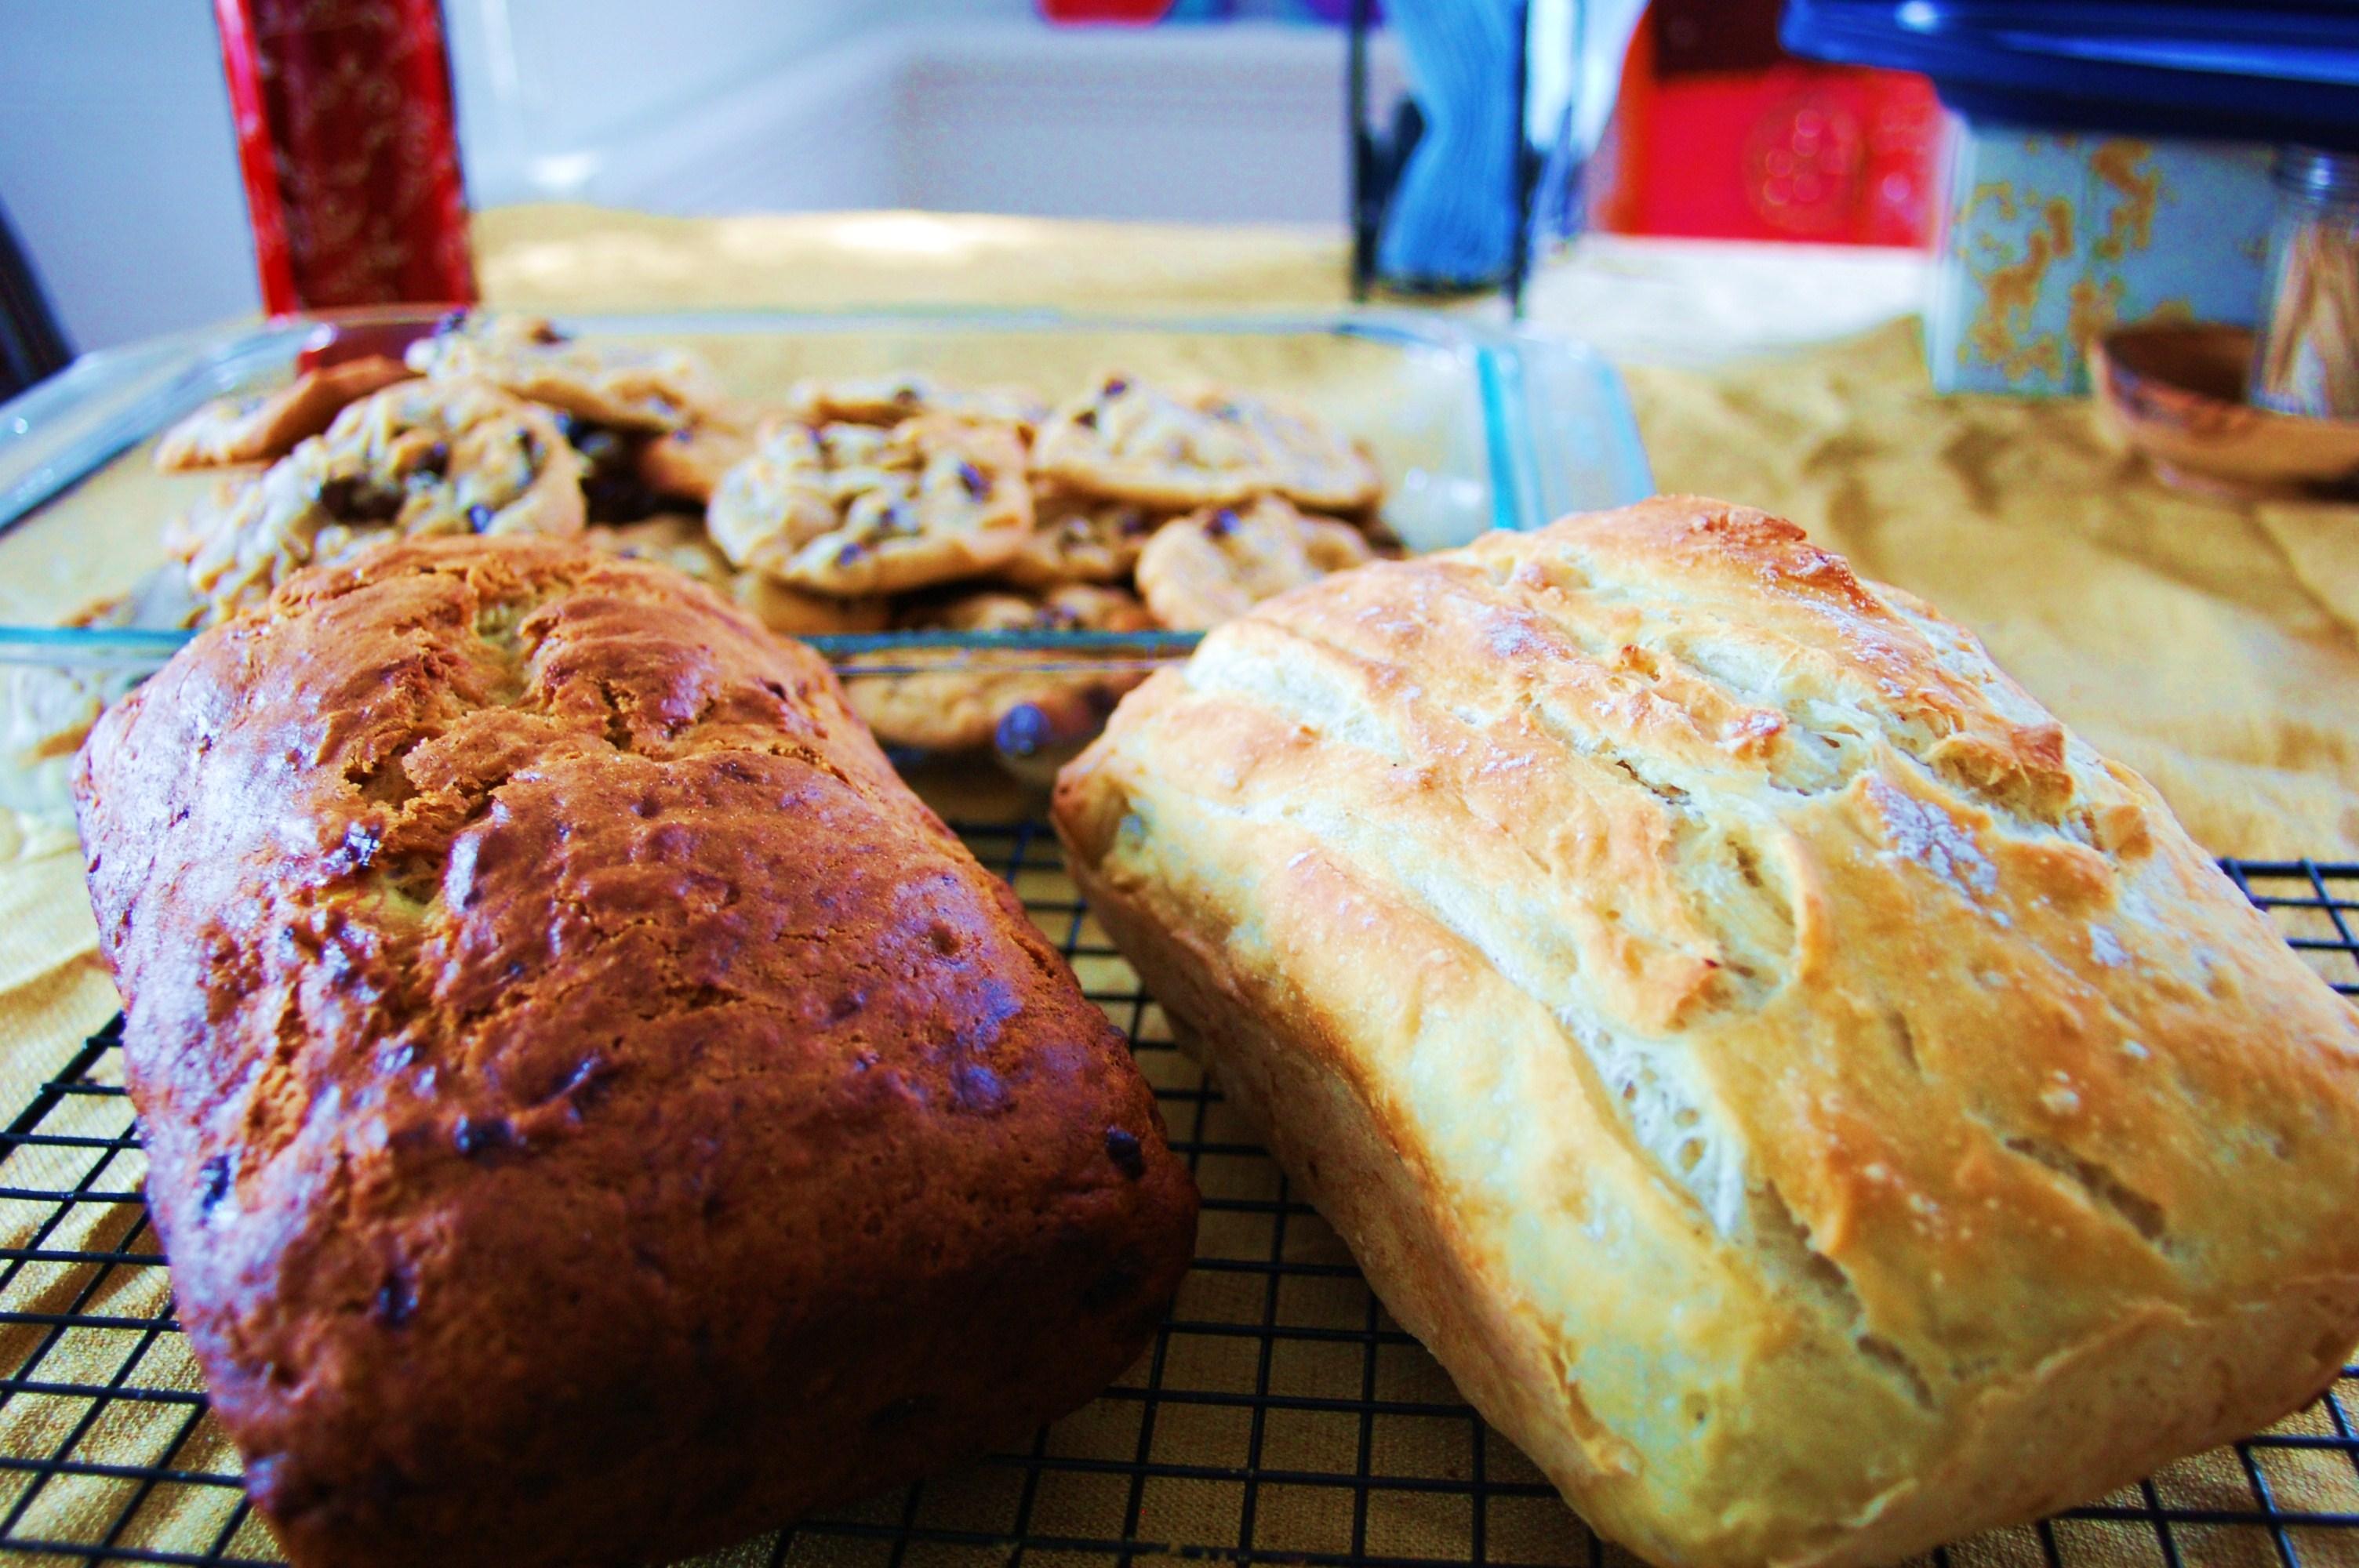 baking n stuff 012